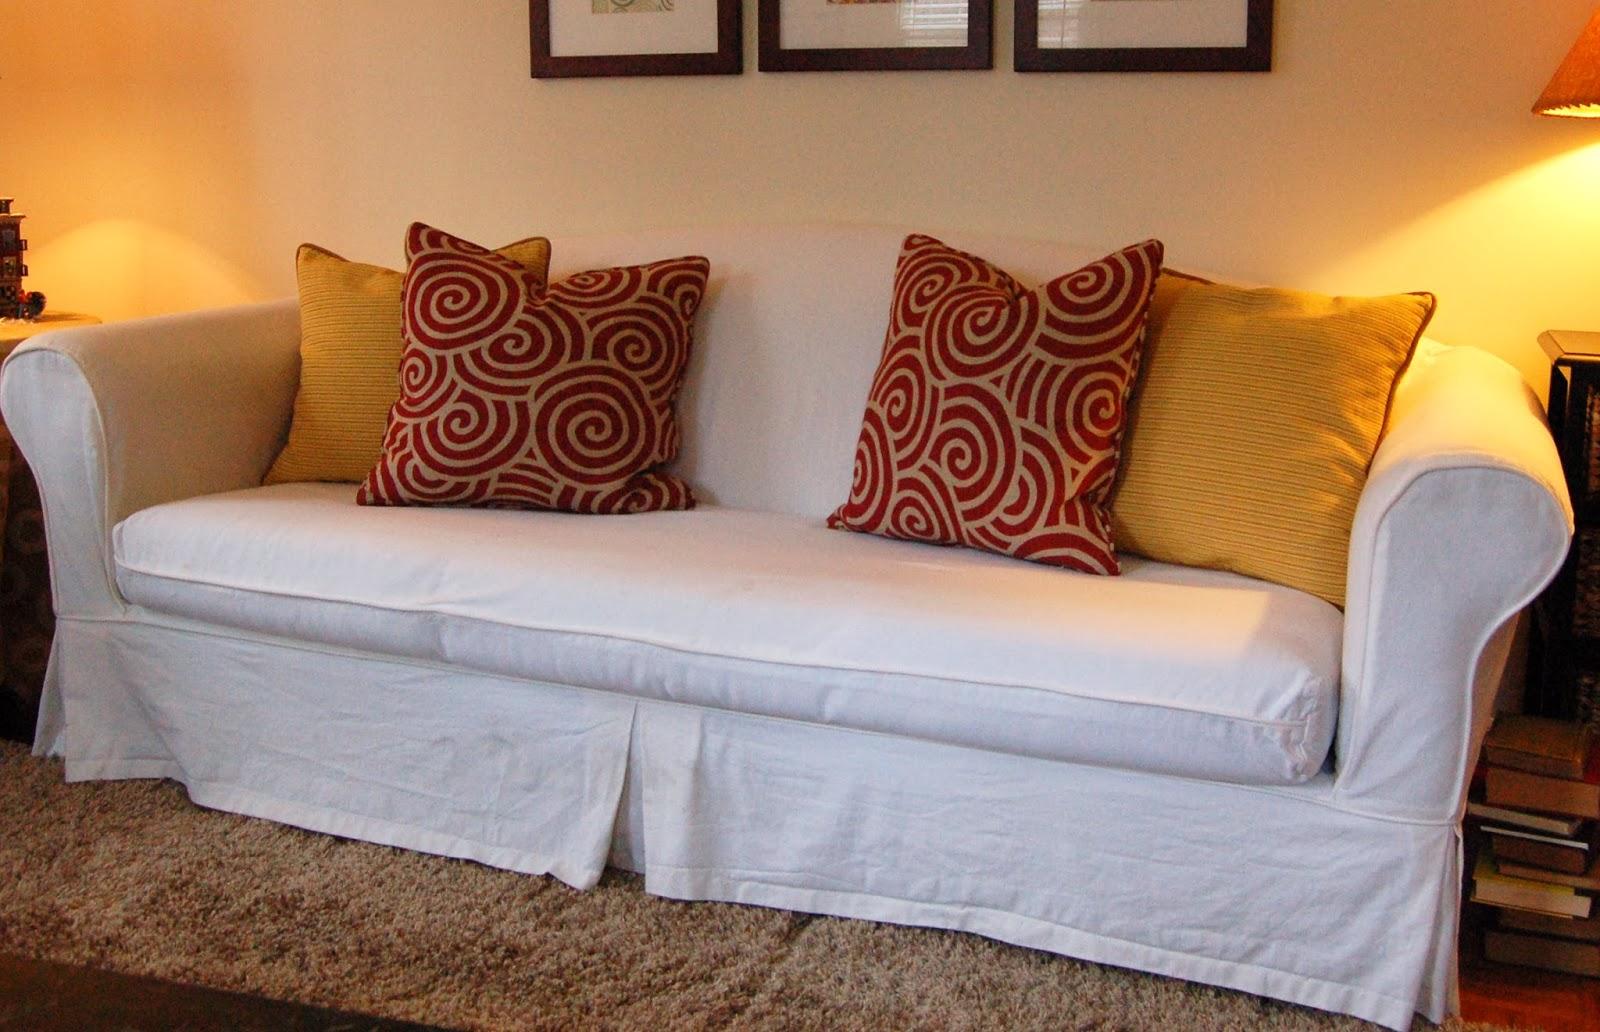 habitat dining room chair covers prospera massage pam morris sews slipcovers